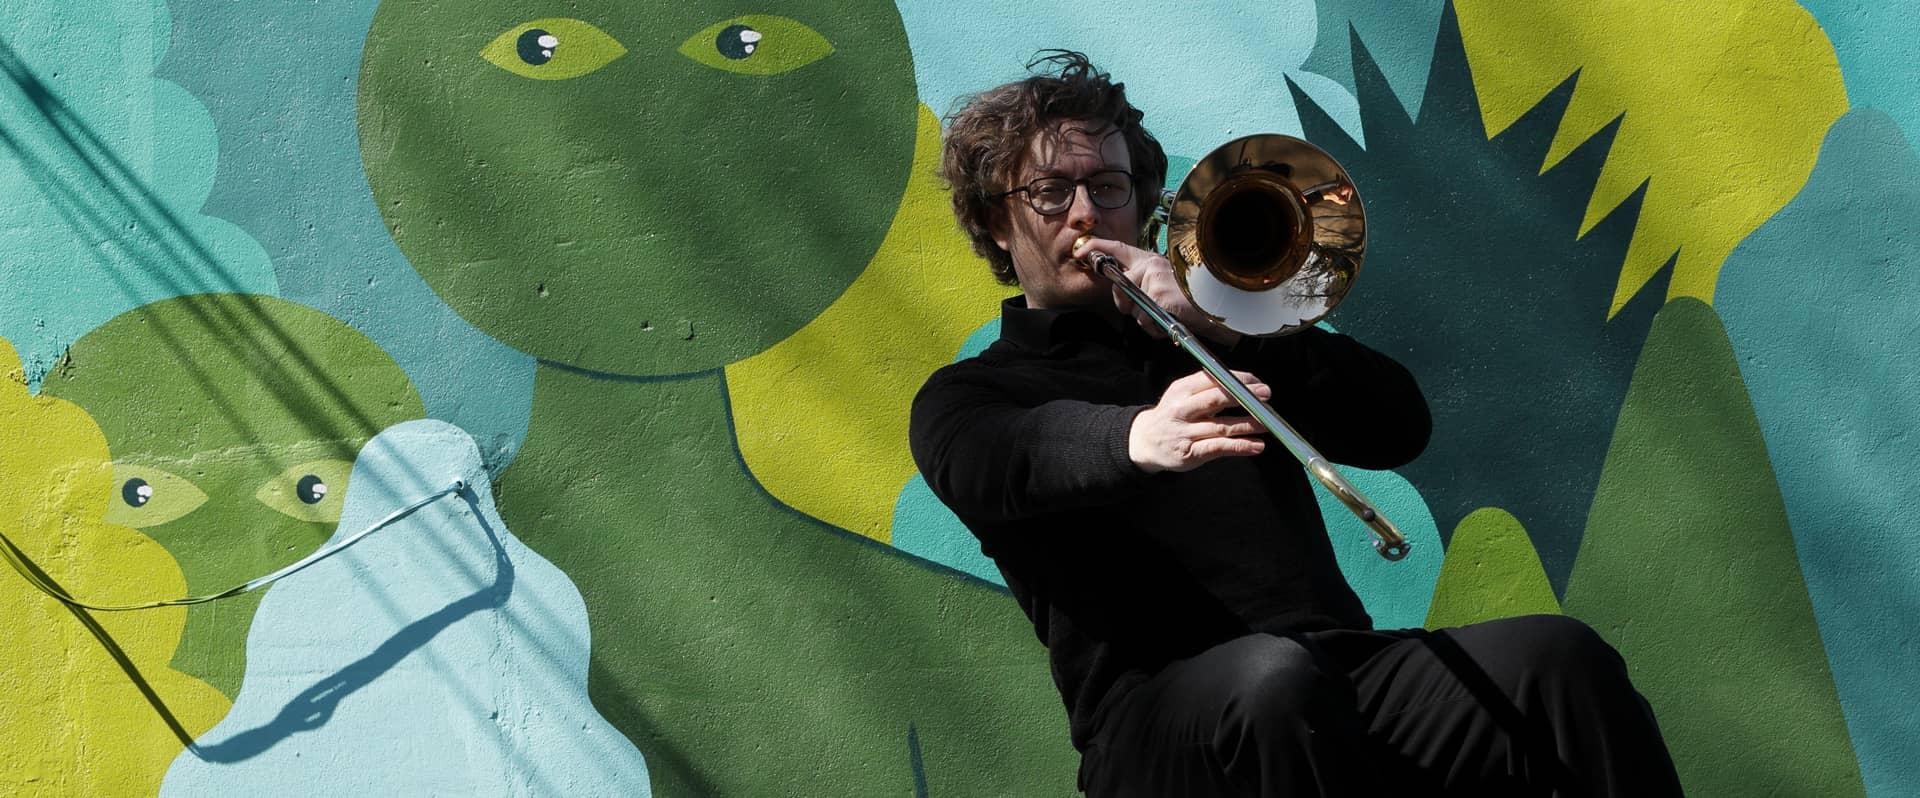 Trombone and aliens - Victoria, BC